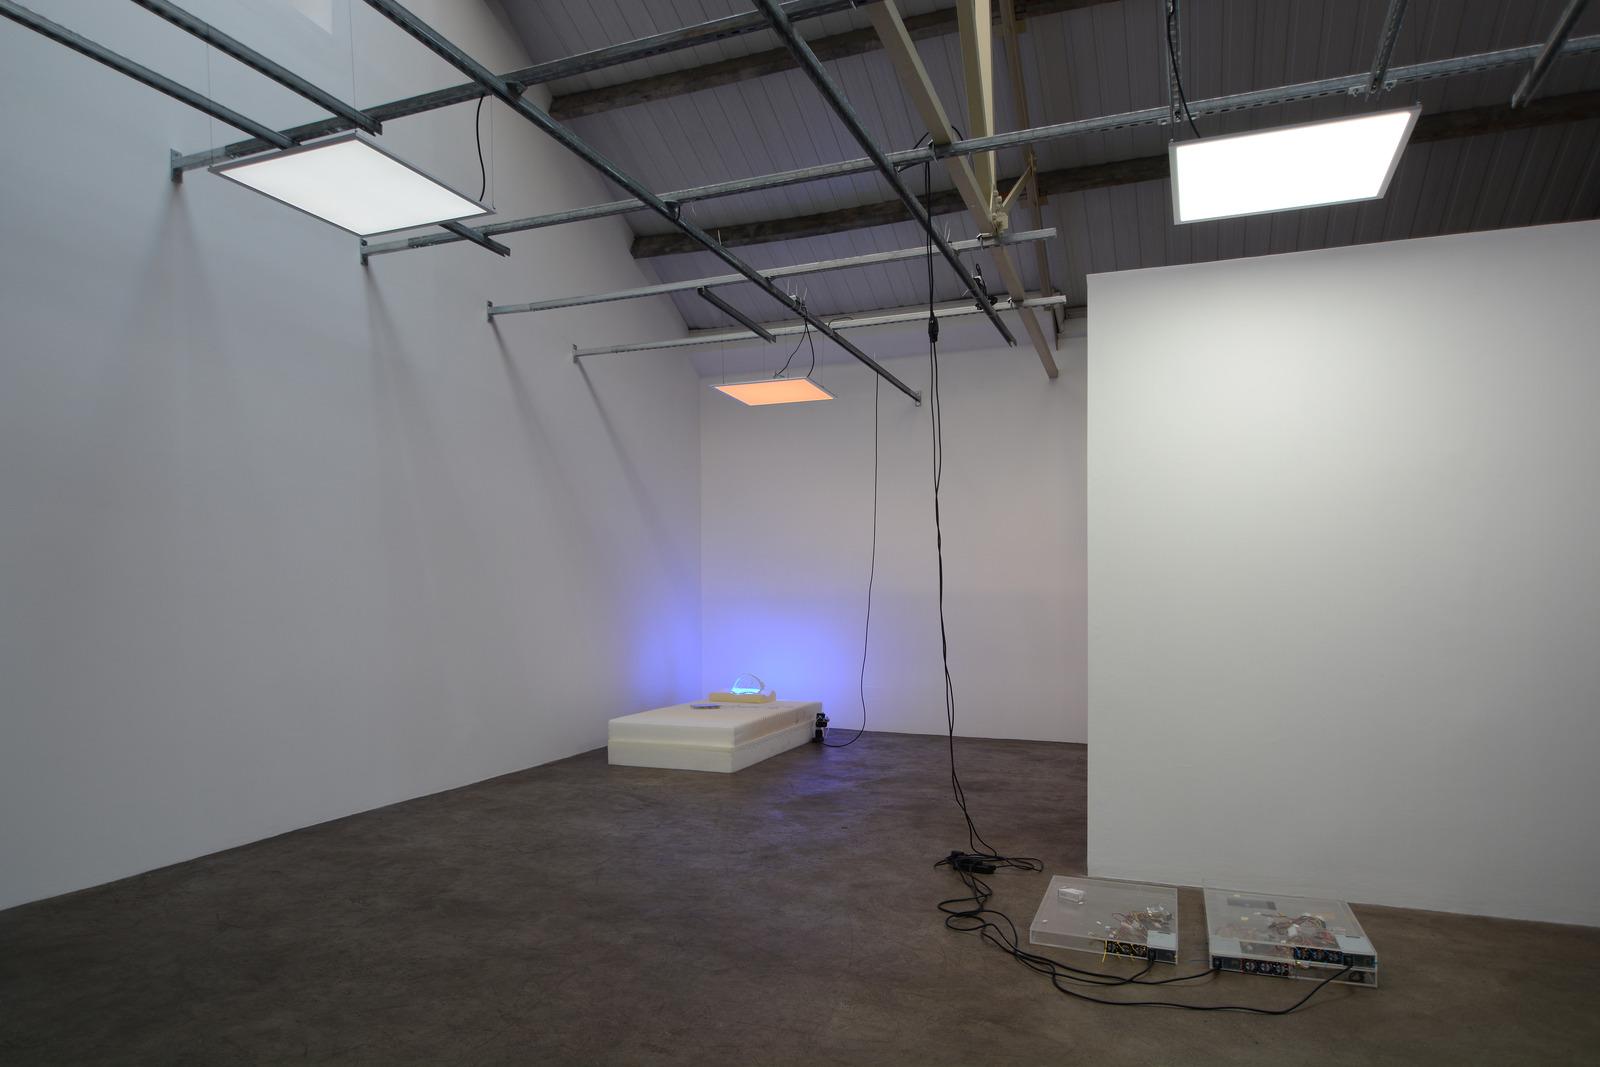 5. Yuri Pattison_sunset provision_installation view_memory foam remembers_dust,scraper, fan